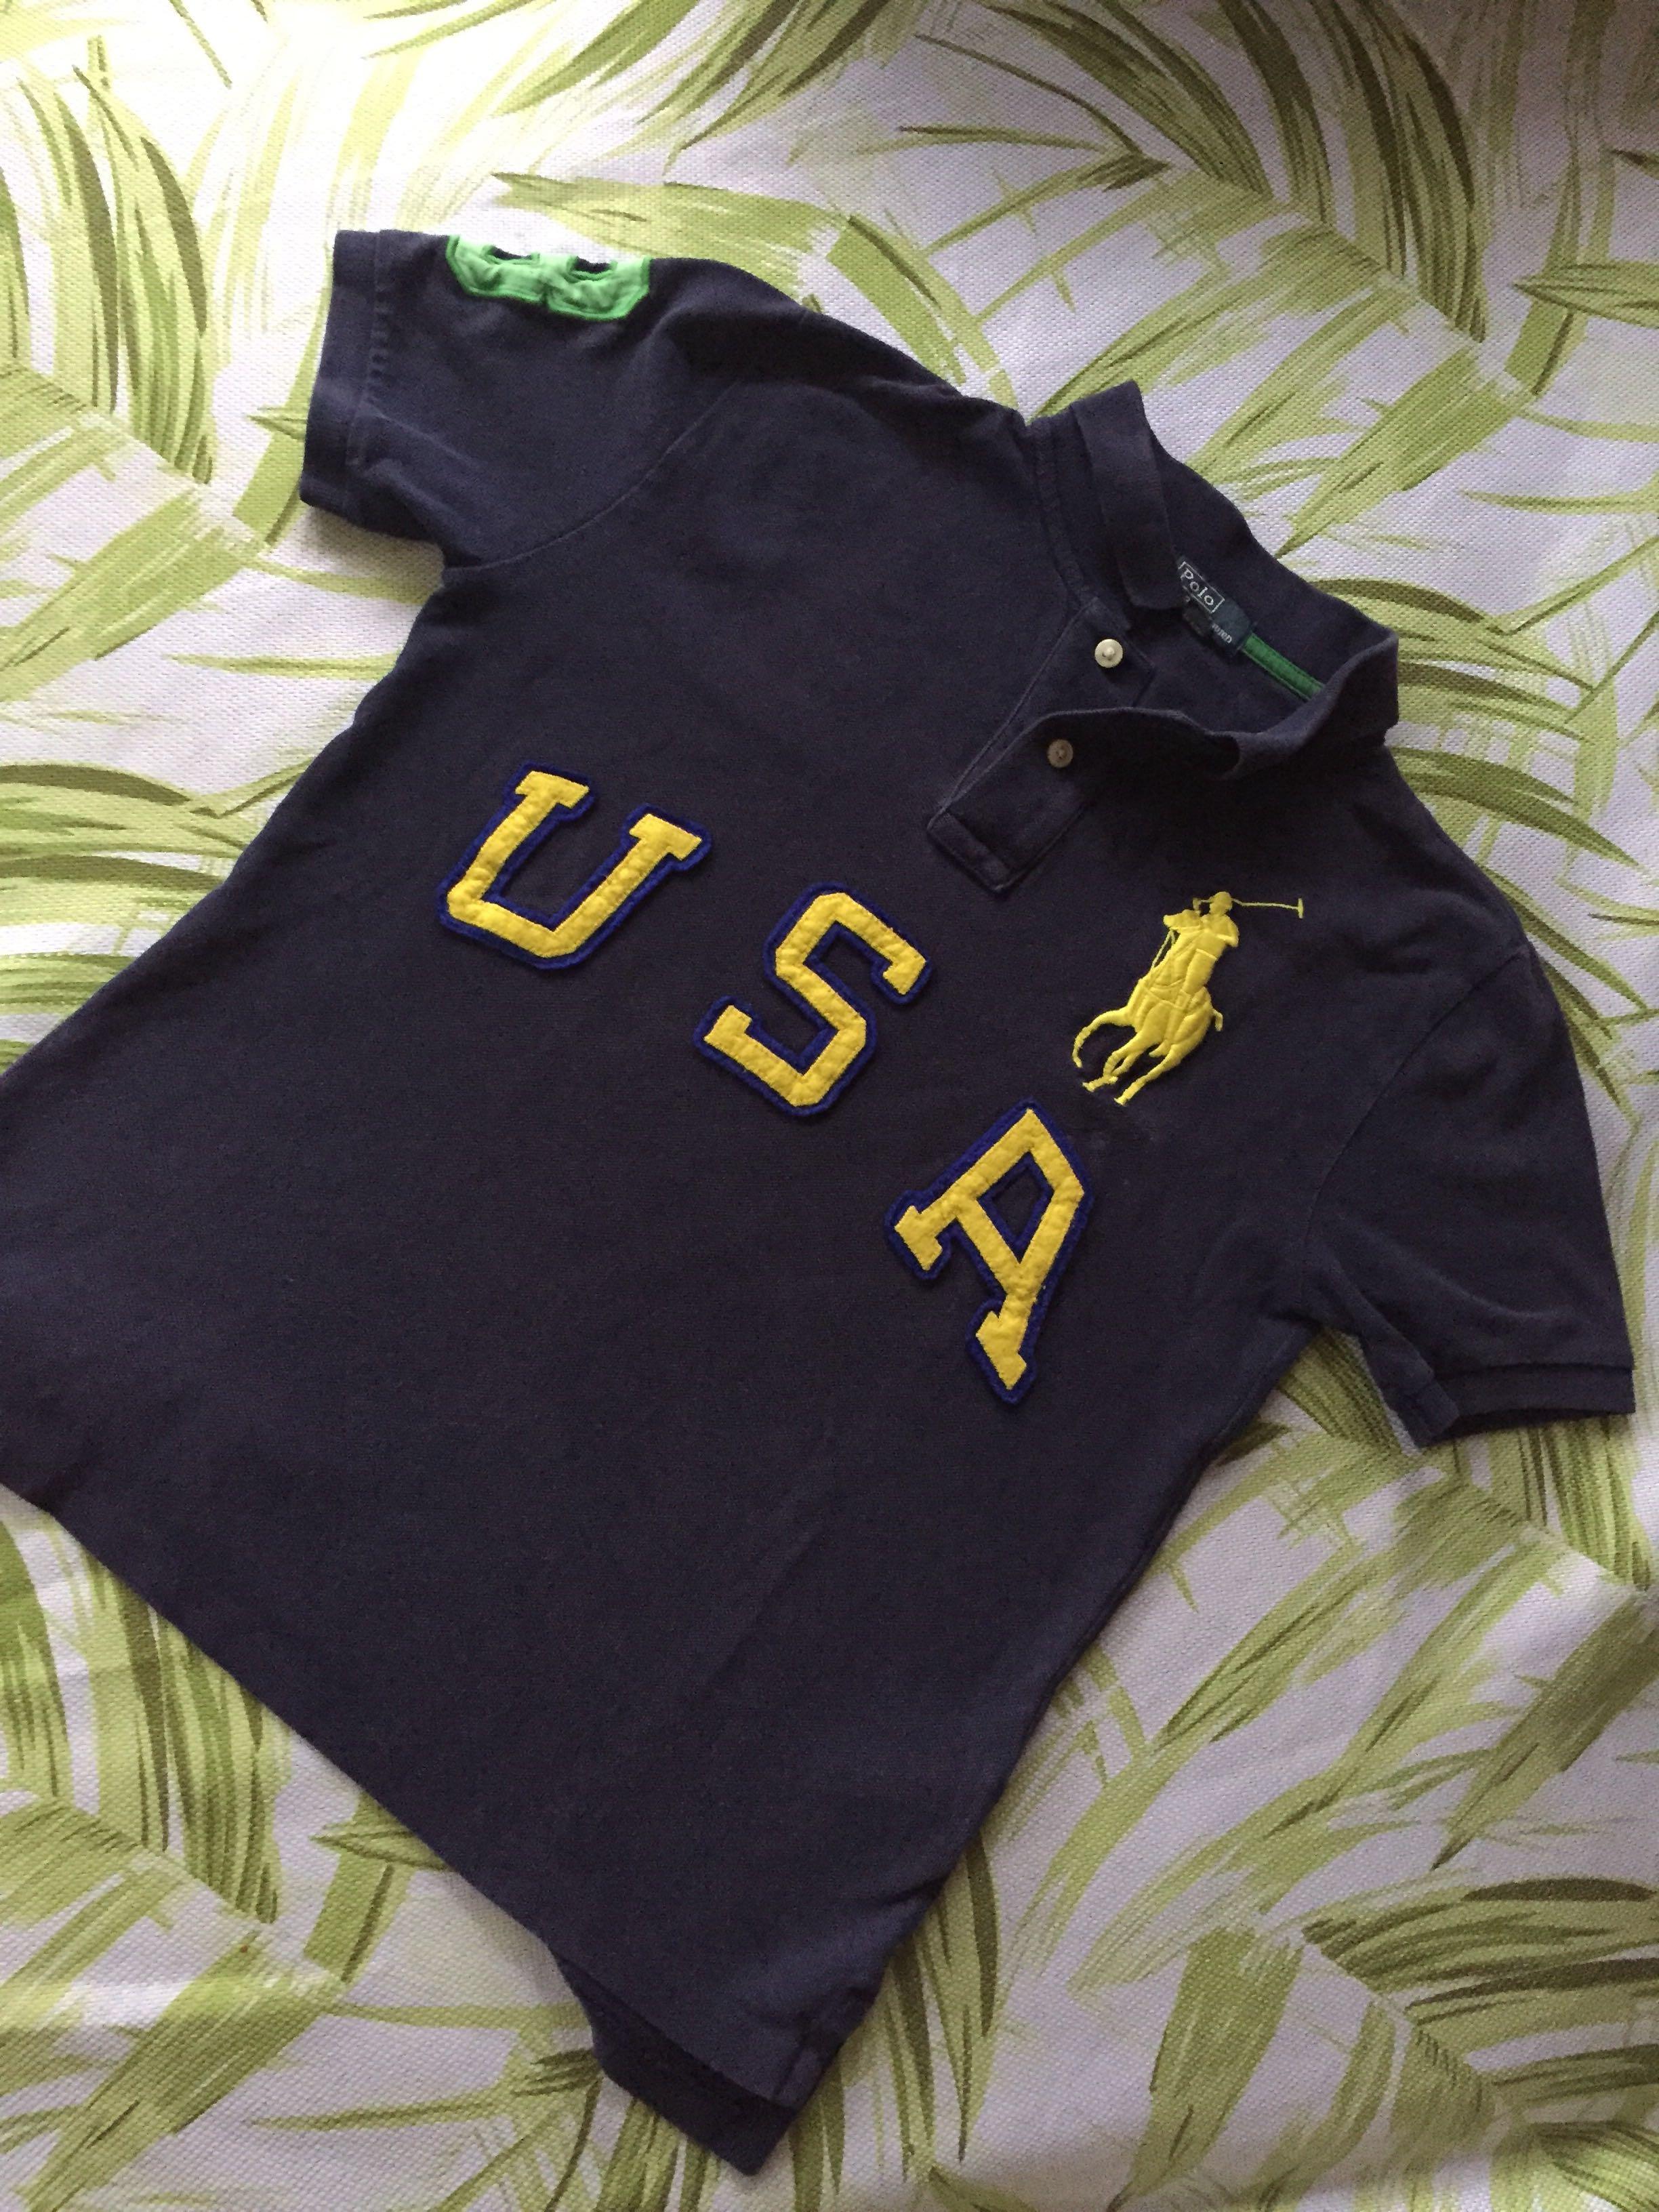 Ralph Lauren Tshirt polo shirt authentic USA